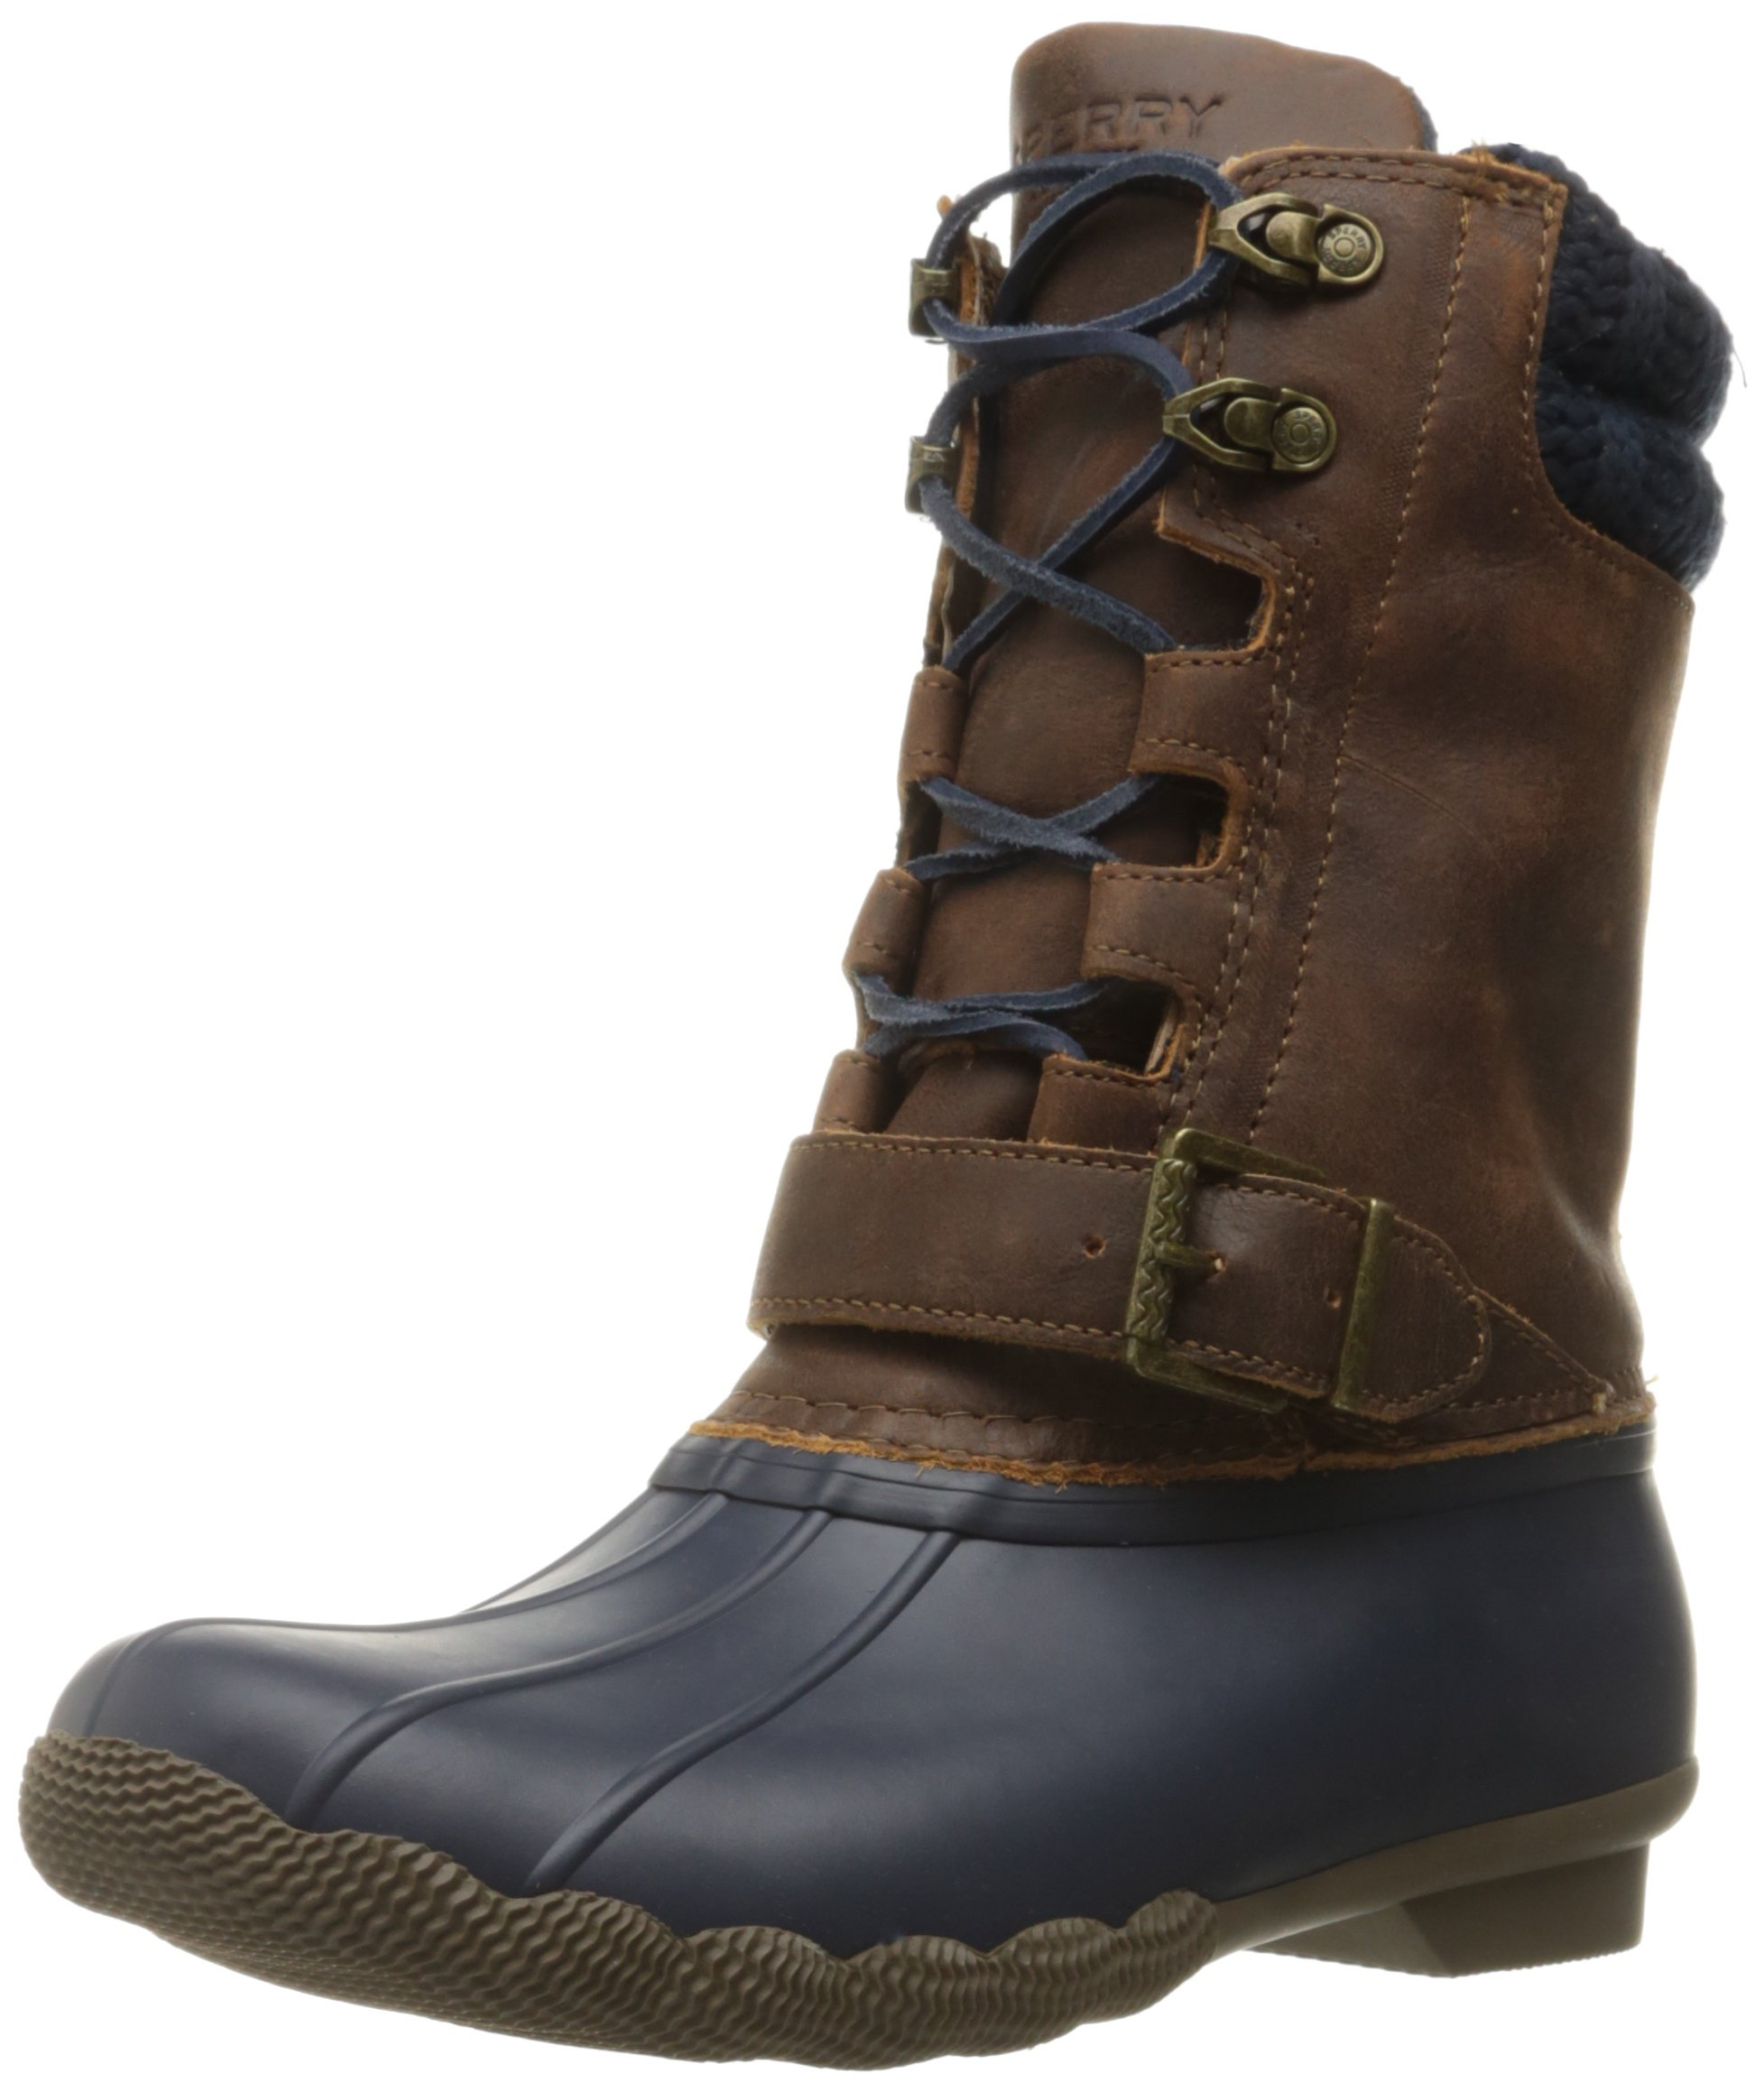 Sperry Top-Sider Women's Saltwater Misty Navy Brown Rain Boot, Navy/Brown, 6.5 M US